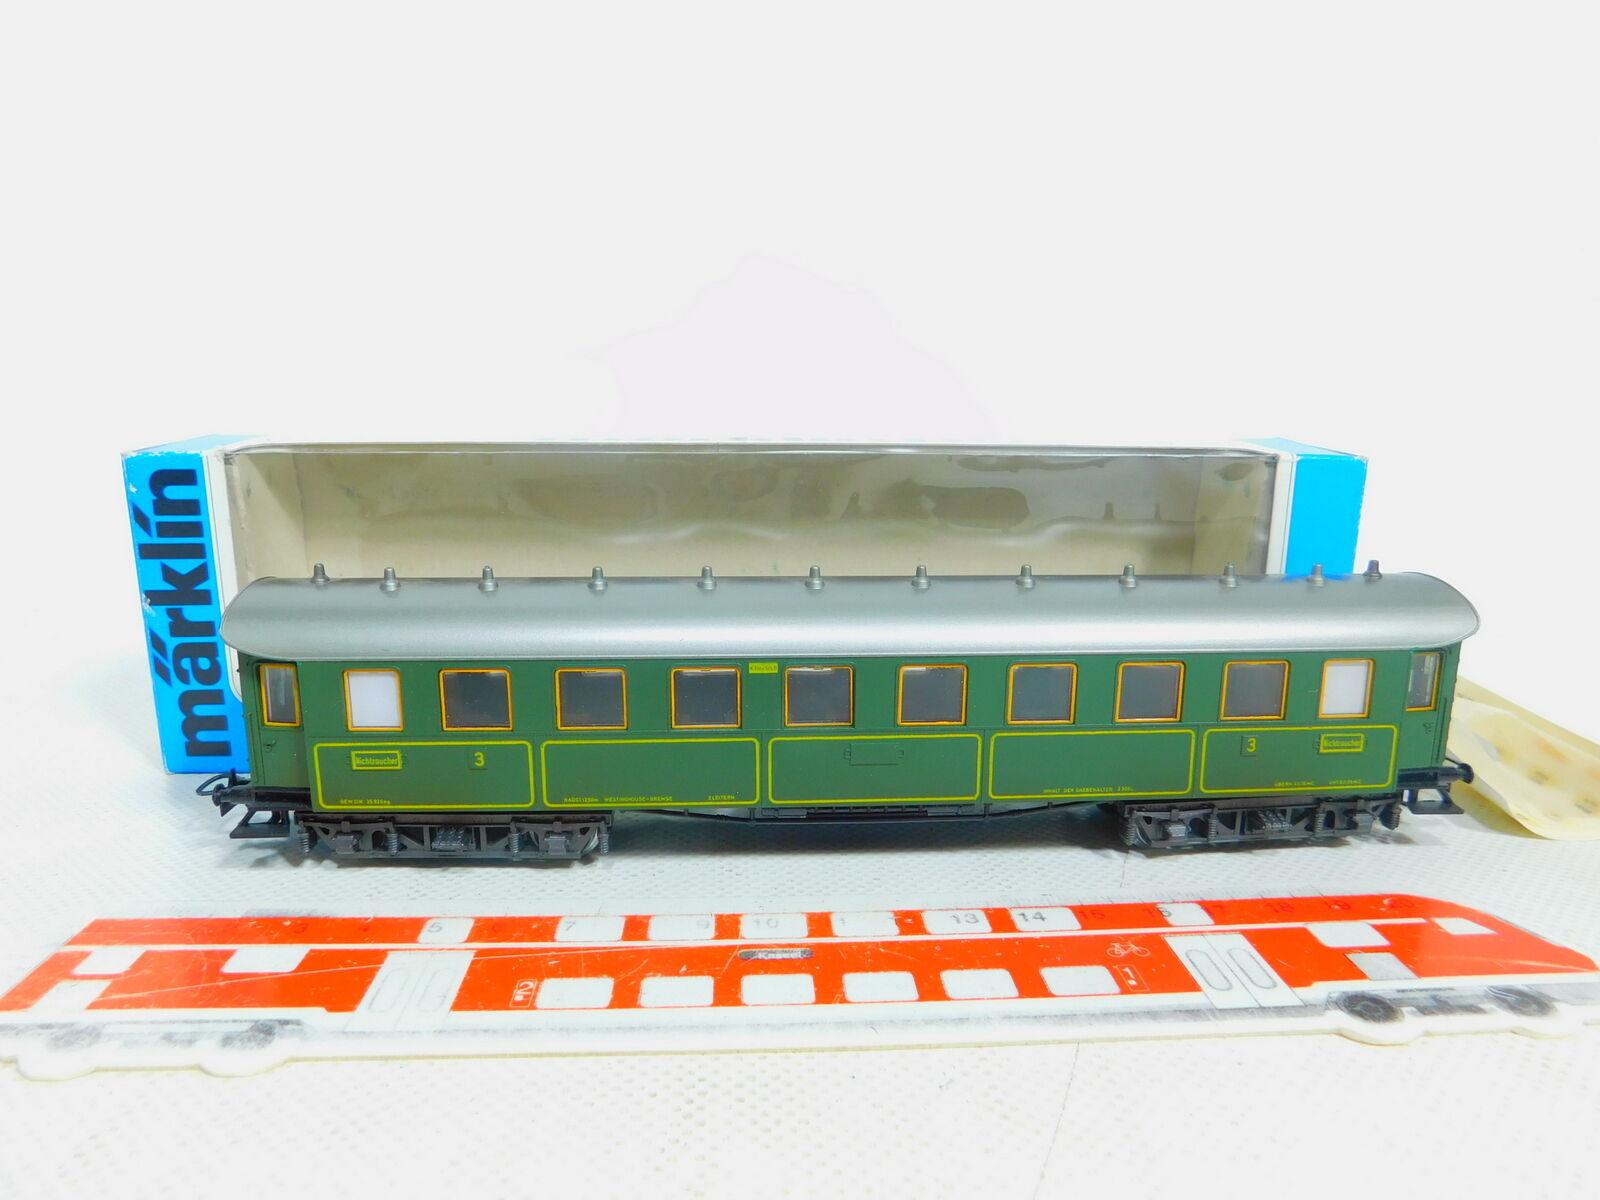 By522-0, 5 Märklin H0 Ac 4135 Passenger Car D-Train Wagon K.Bay.sts.b. Ovp